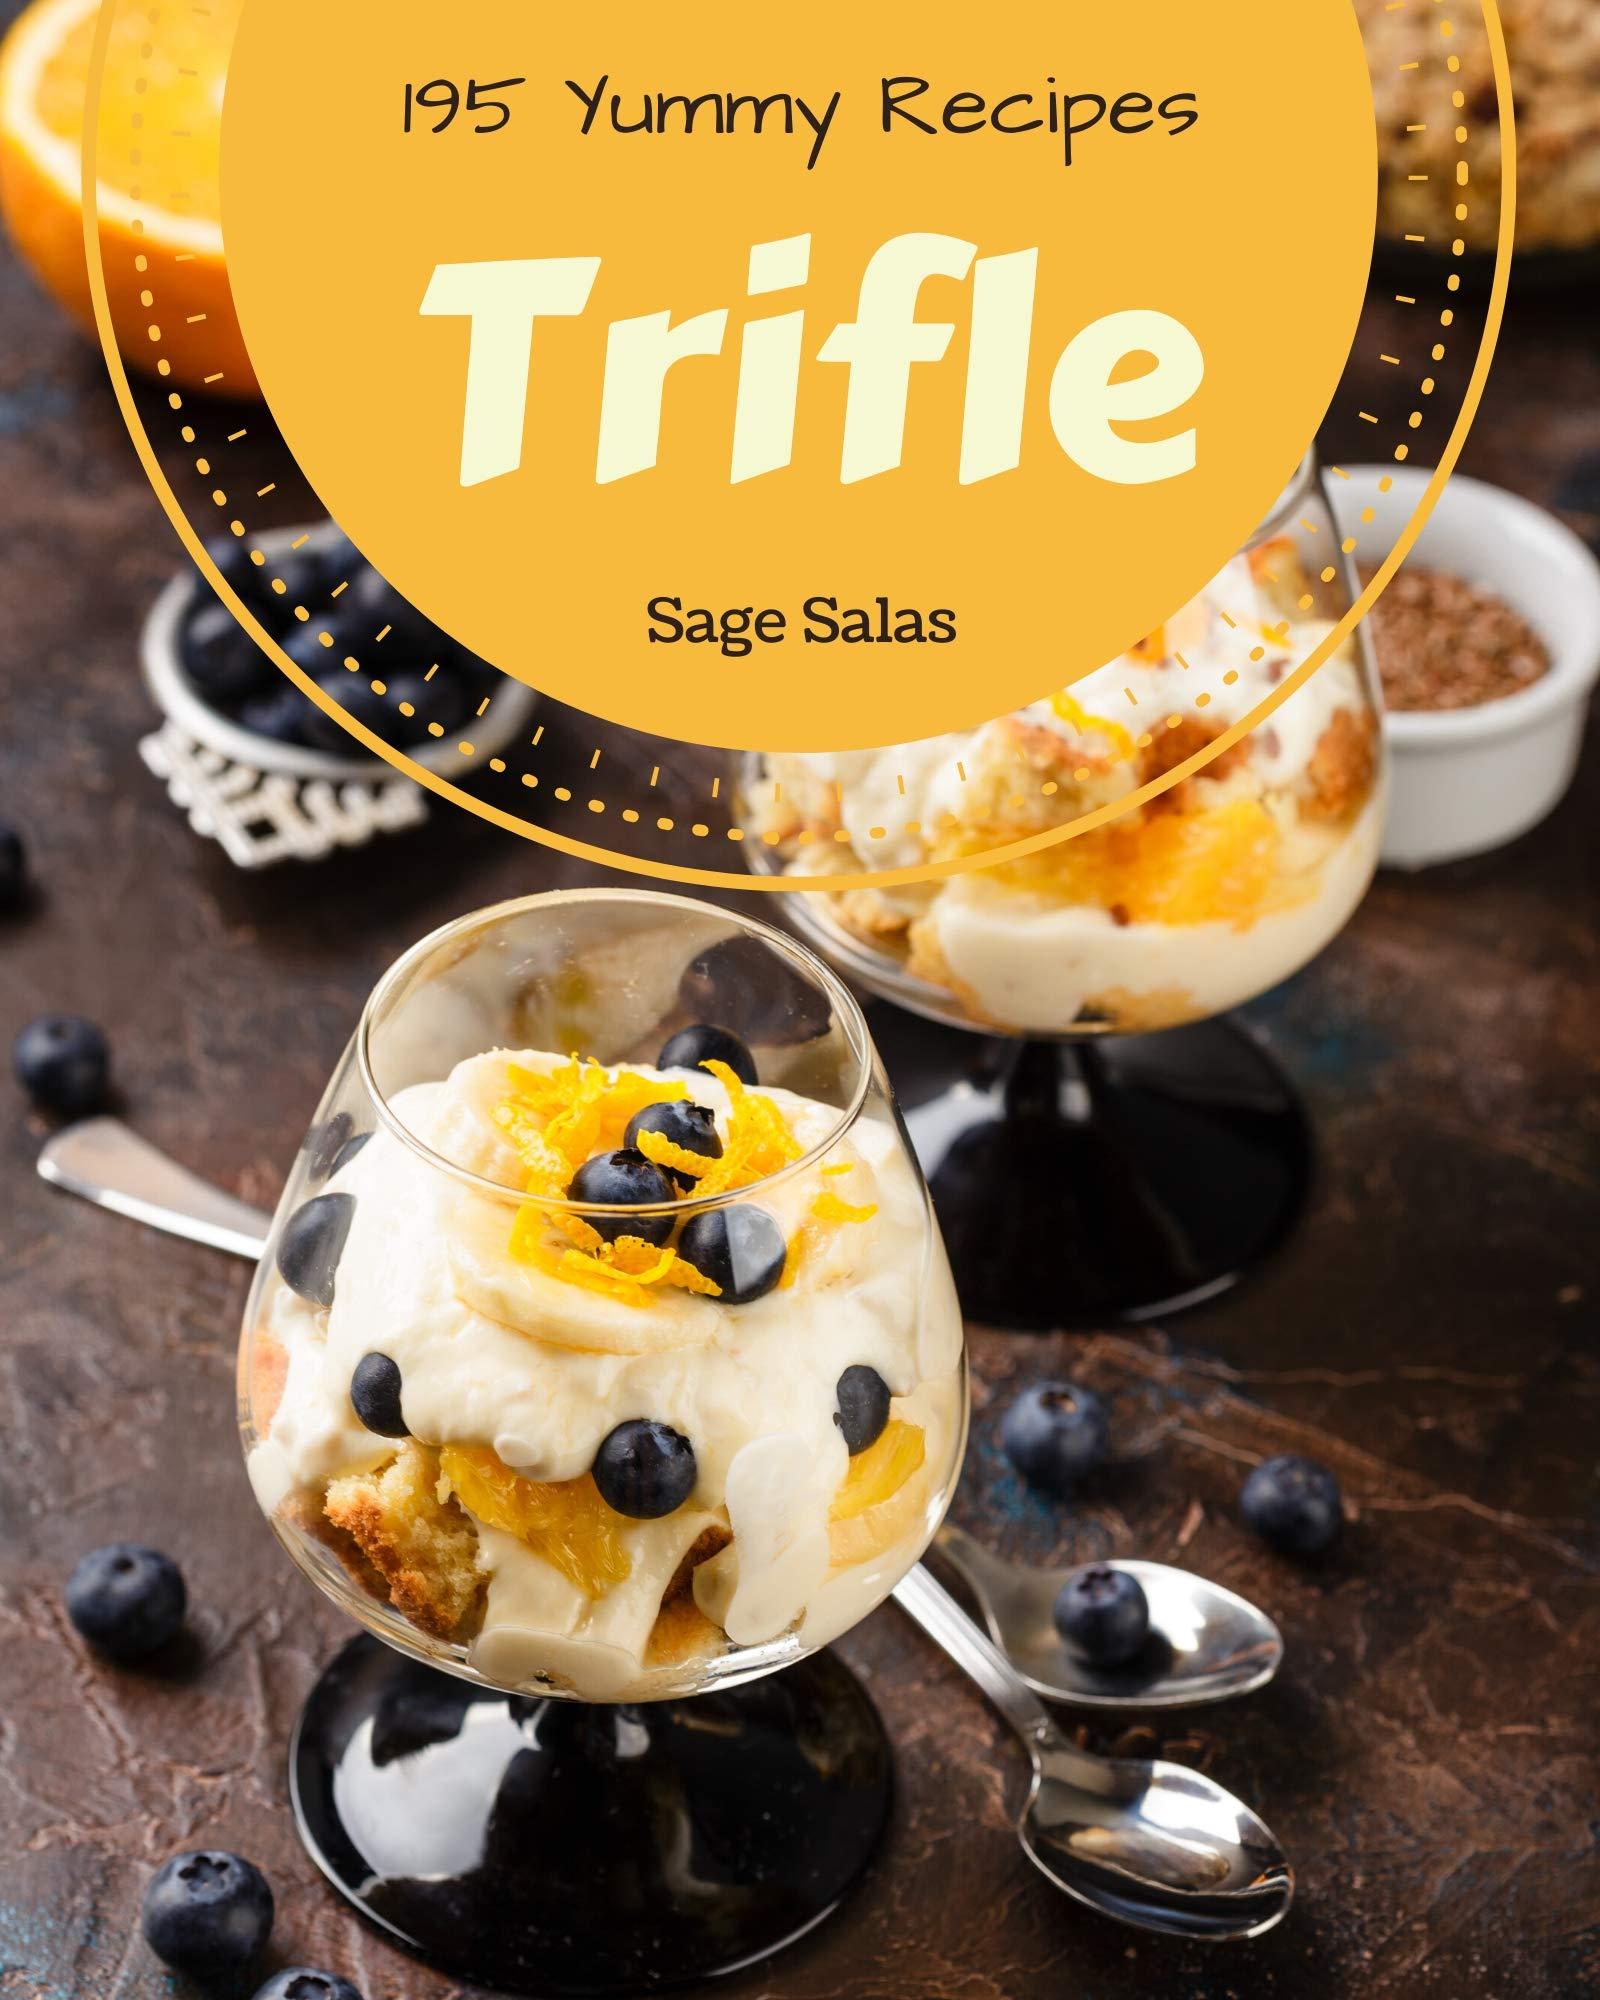 195 Yummy Trifle Recipes: Explore Yummy Trifle Cookbook NOW!